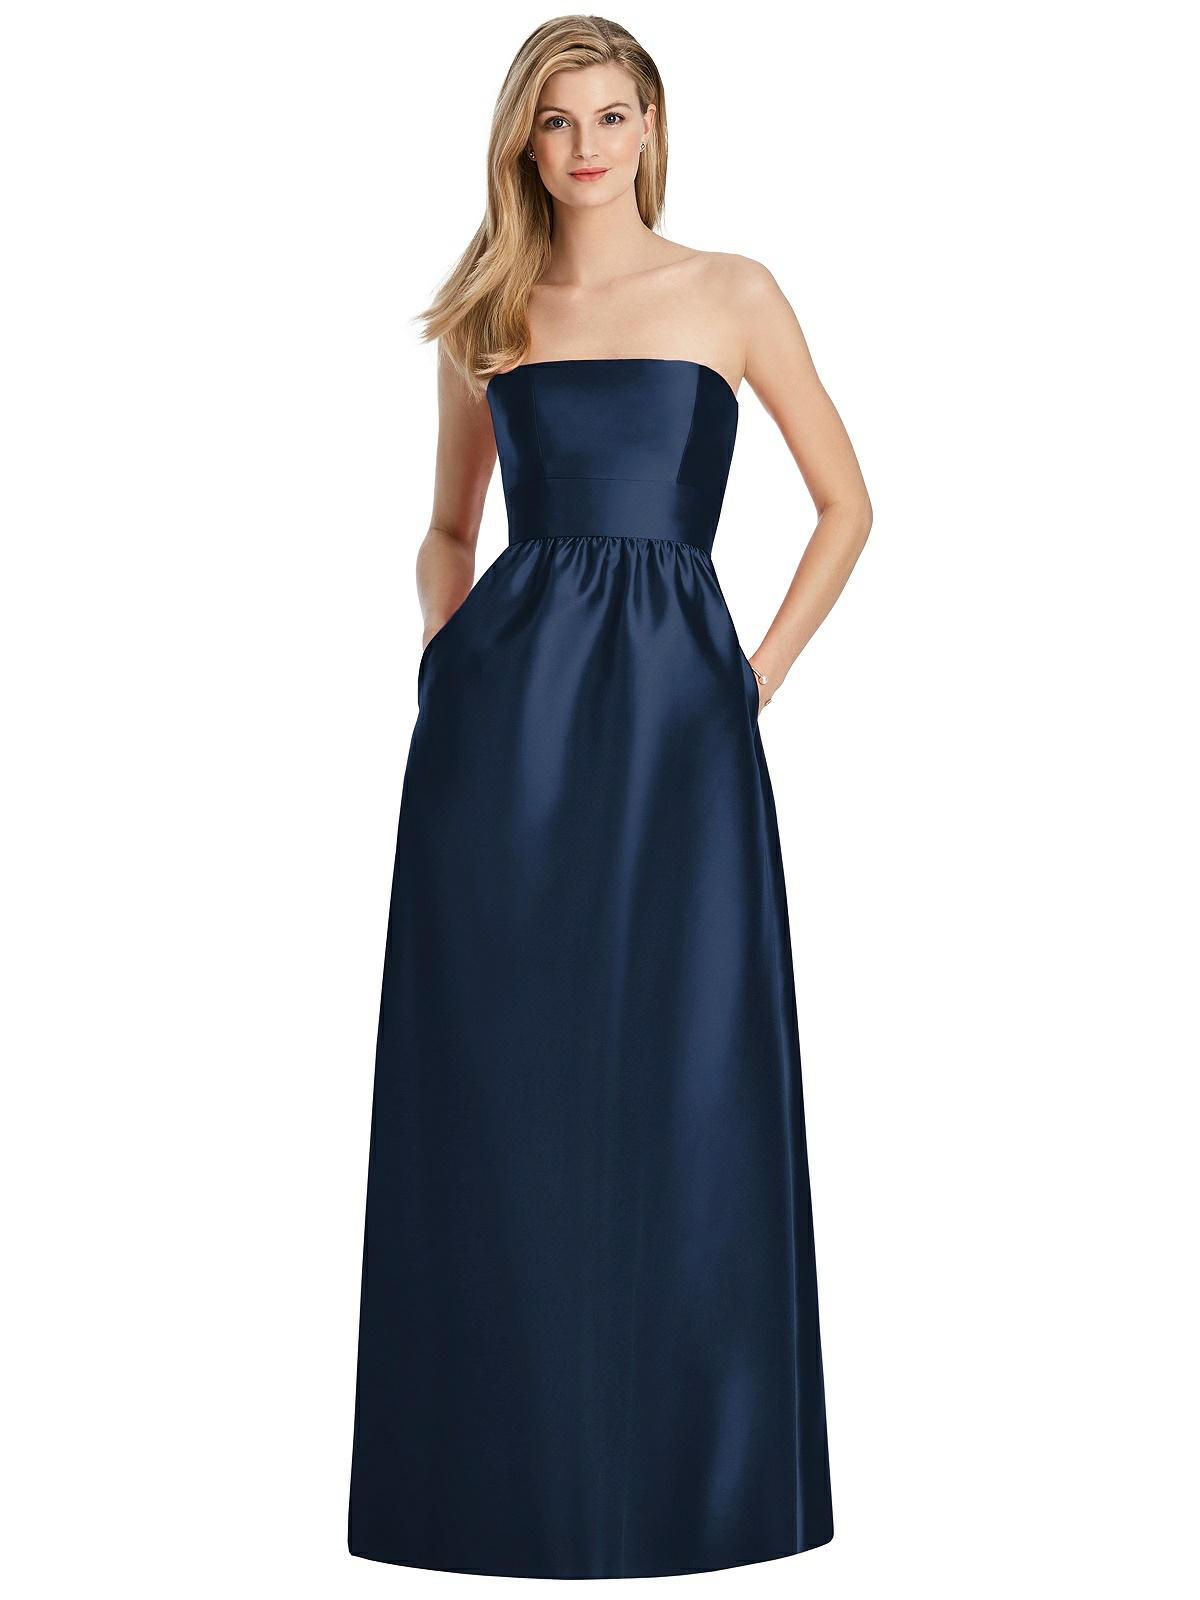 1960s Evening Dresses, Bridesmaids, Mothers Gowns Special Order Lela Rose Bridesmaid Dress LR248 $242.00 AT vintagedancer.com